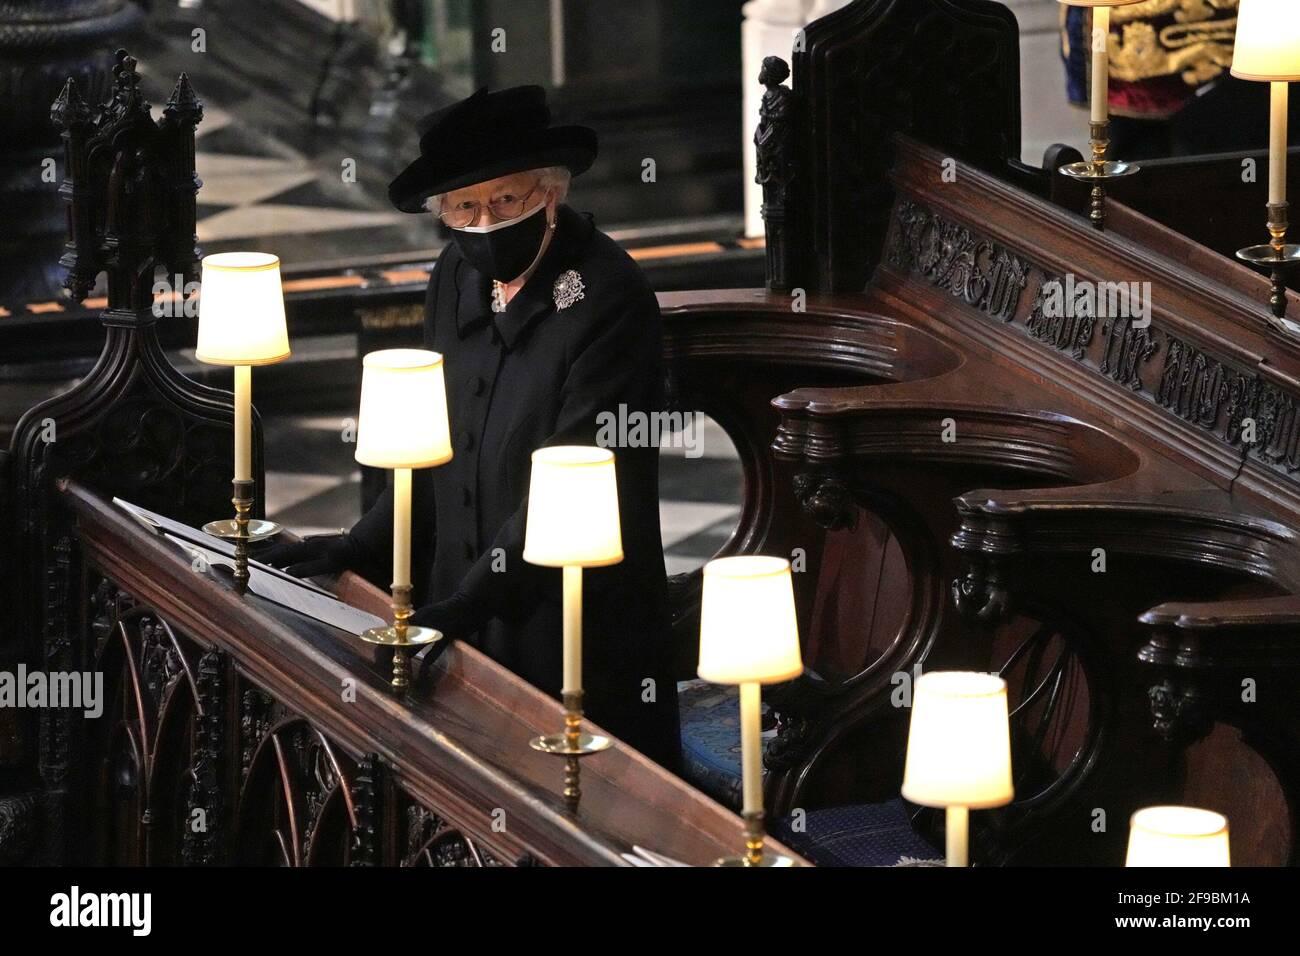 Reina Isabel II durante el funeral del Duque de Edimburgo en la Capilla de San Jorge, Castillo de Windsor, Berkshire. Fecha de la foto: Sábado 17 de abril de 2021. Foto de stock